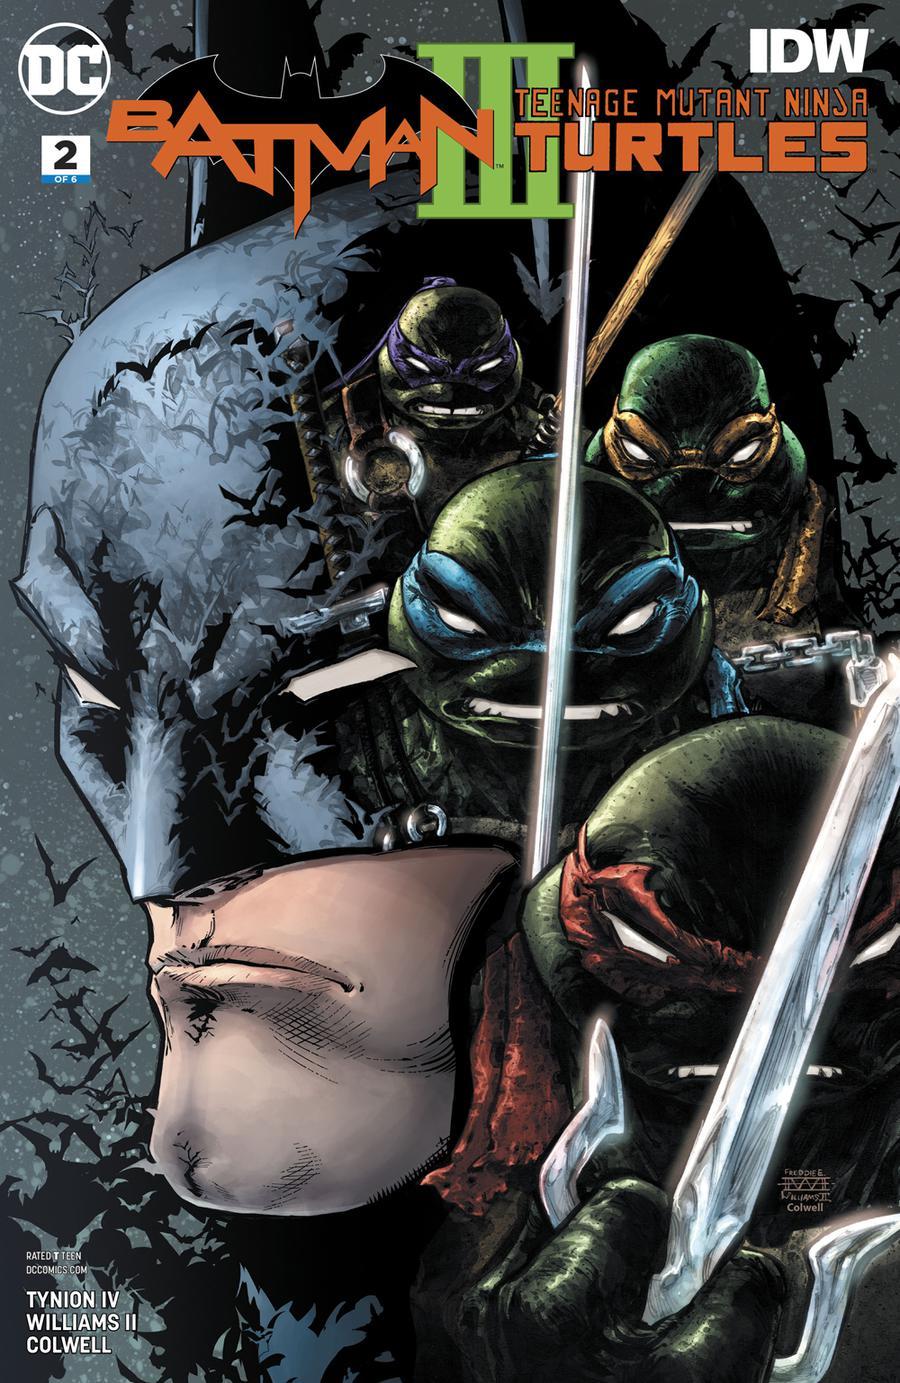 Batman Teenage Mutant Ninja Turtles III #2 Cover A Regular Freddie E Williams II Cover